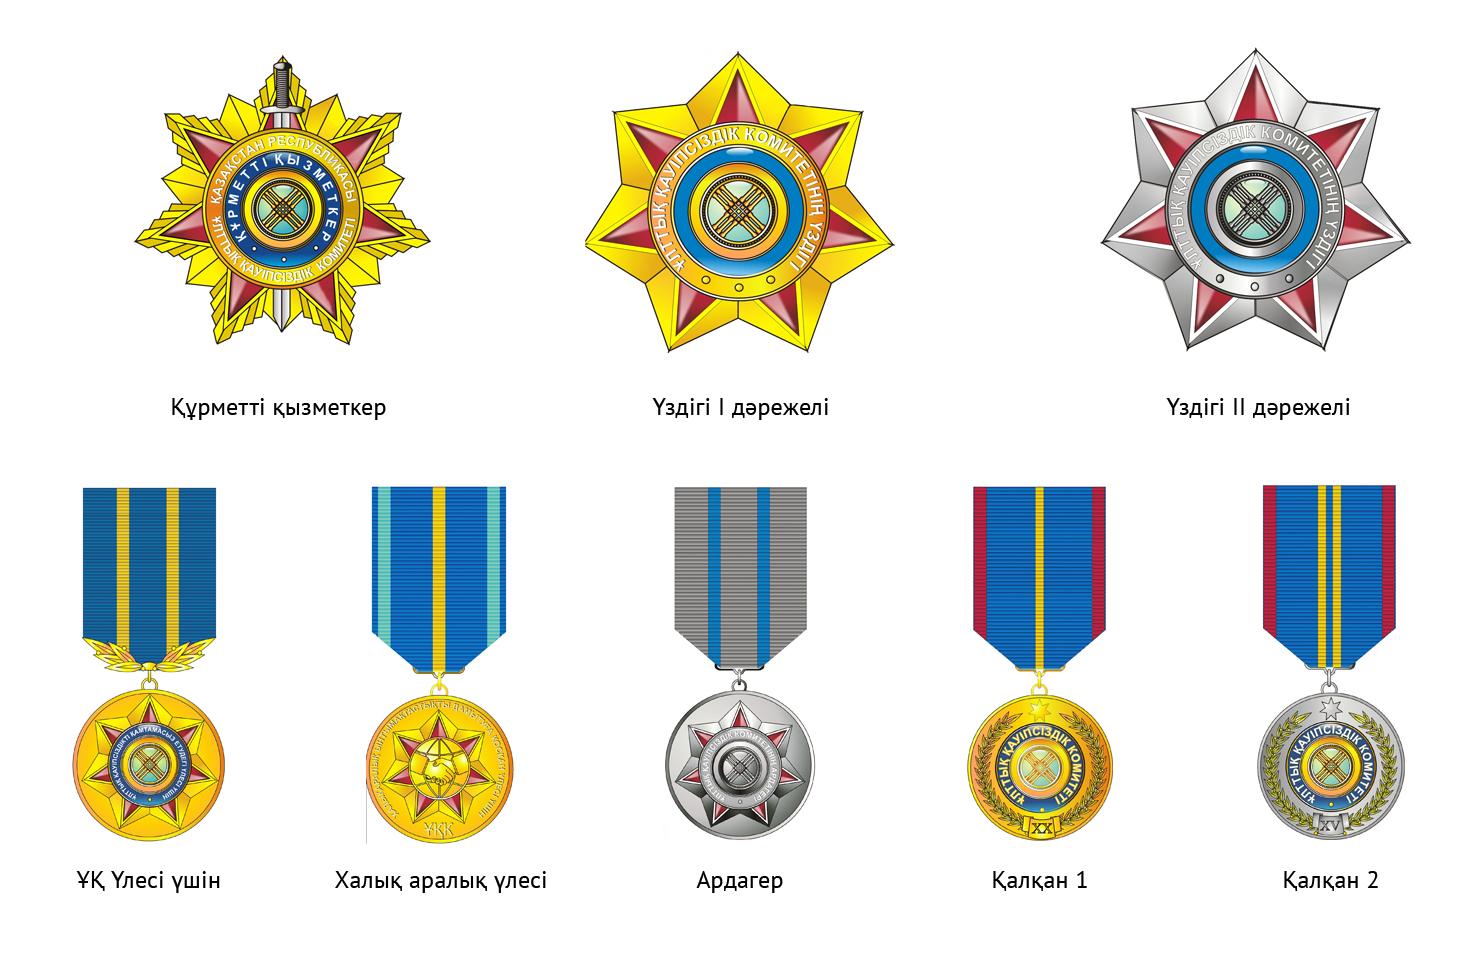 кгб казахстана